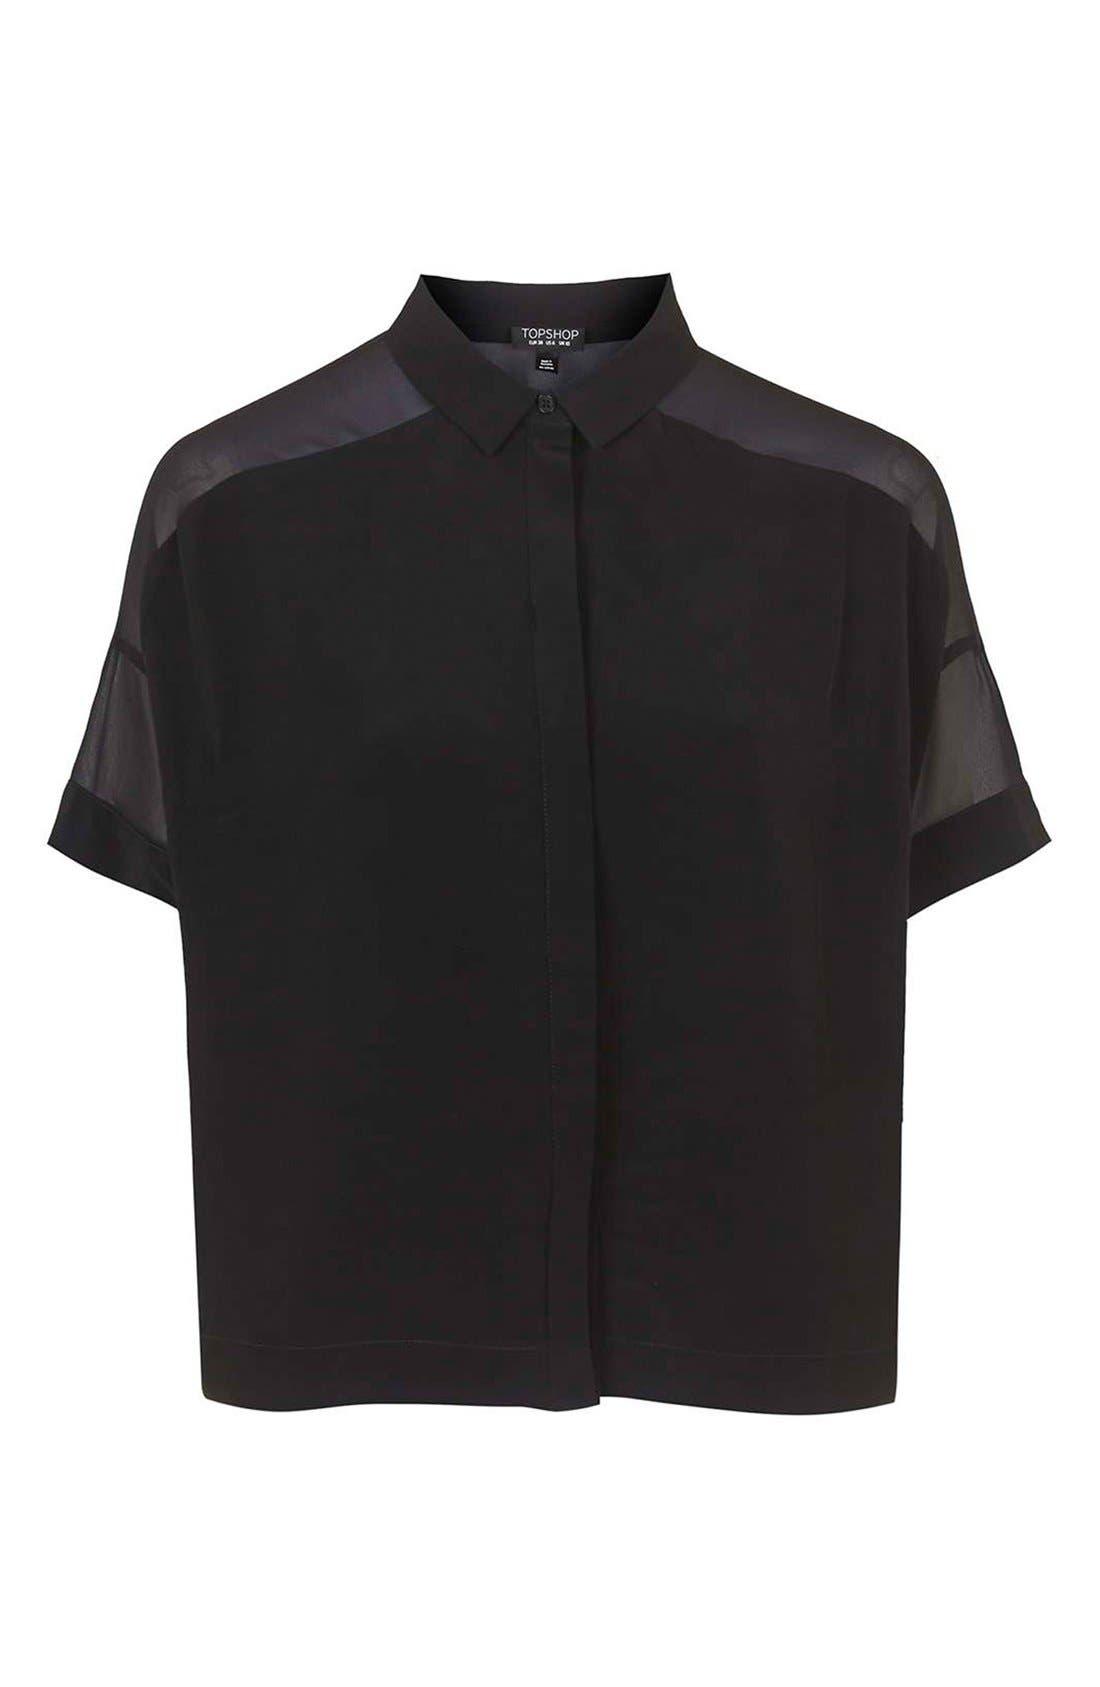 Alternate Image 4  - Topshop Chiffon Panel Shirt